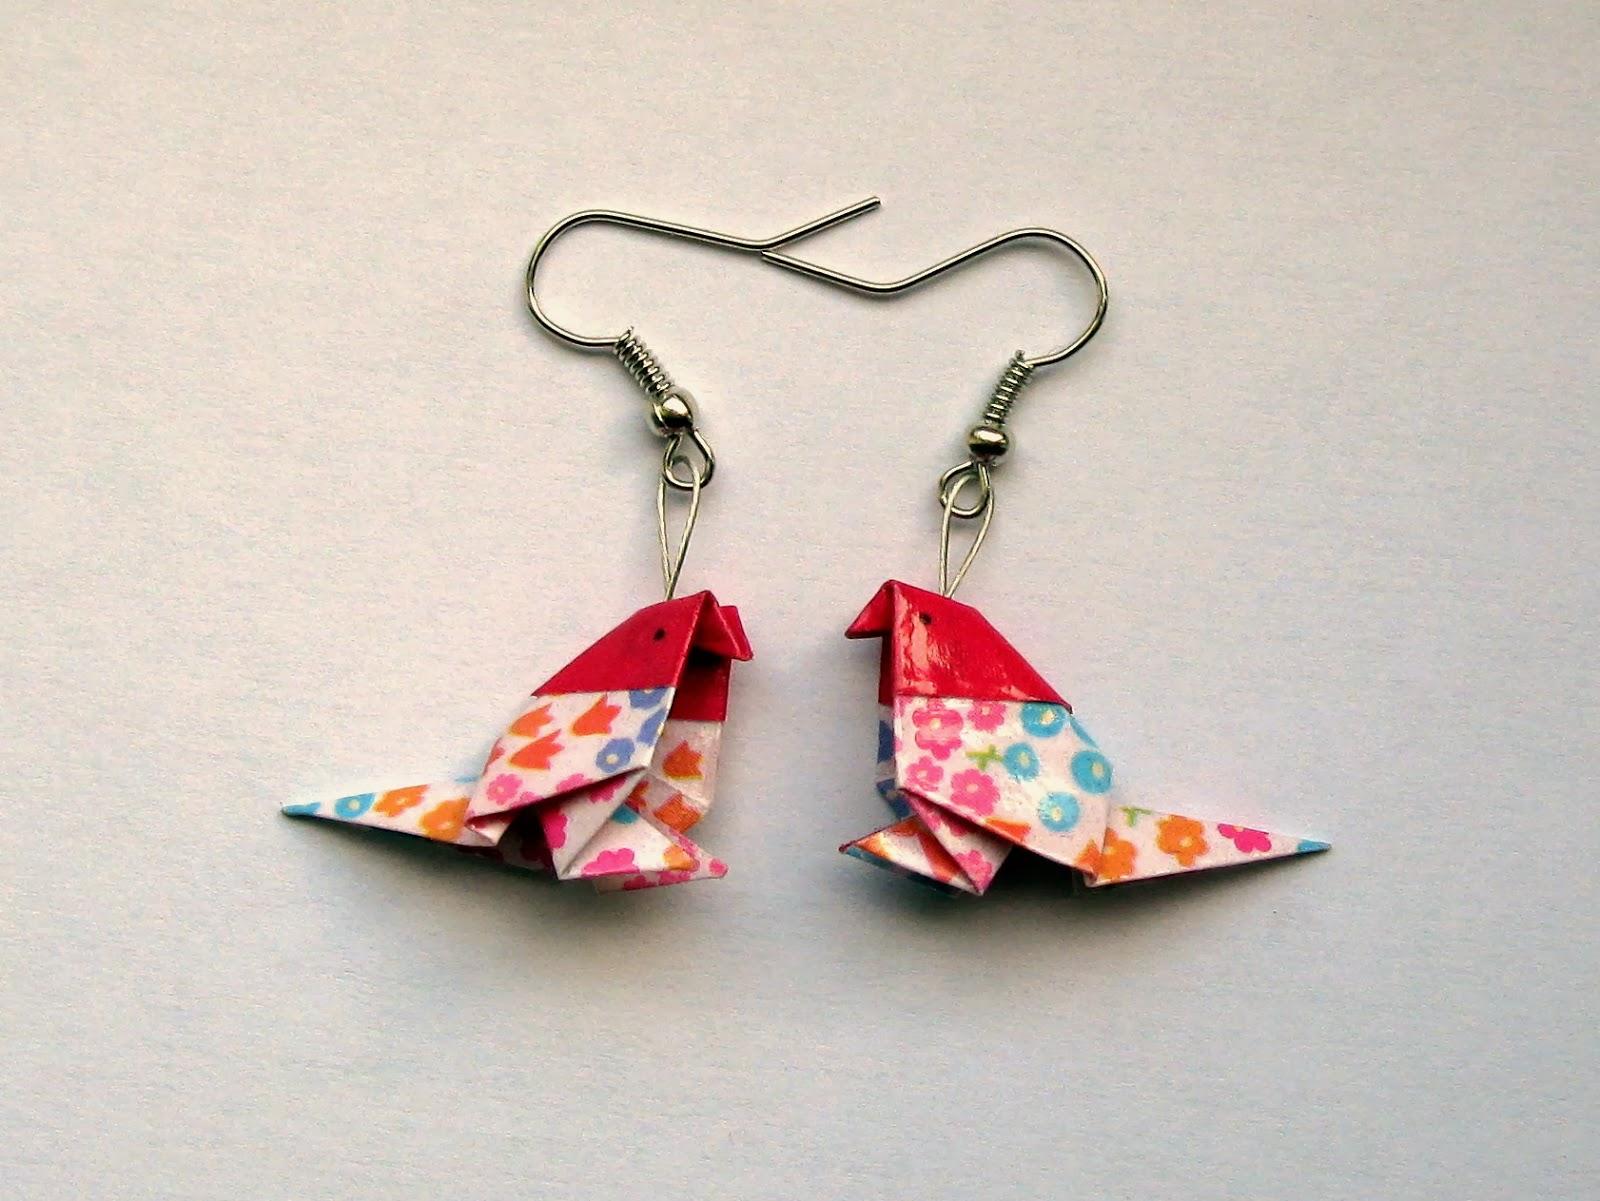 http://www.alittlemarket.com/boucles-d-oreille/boucles_d_oreille_origami_oiseau_fuchsia_blanc_multicolore-6758265.html